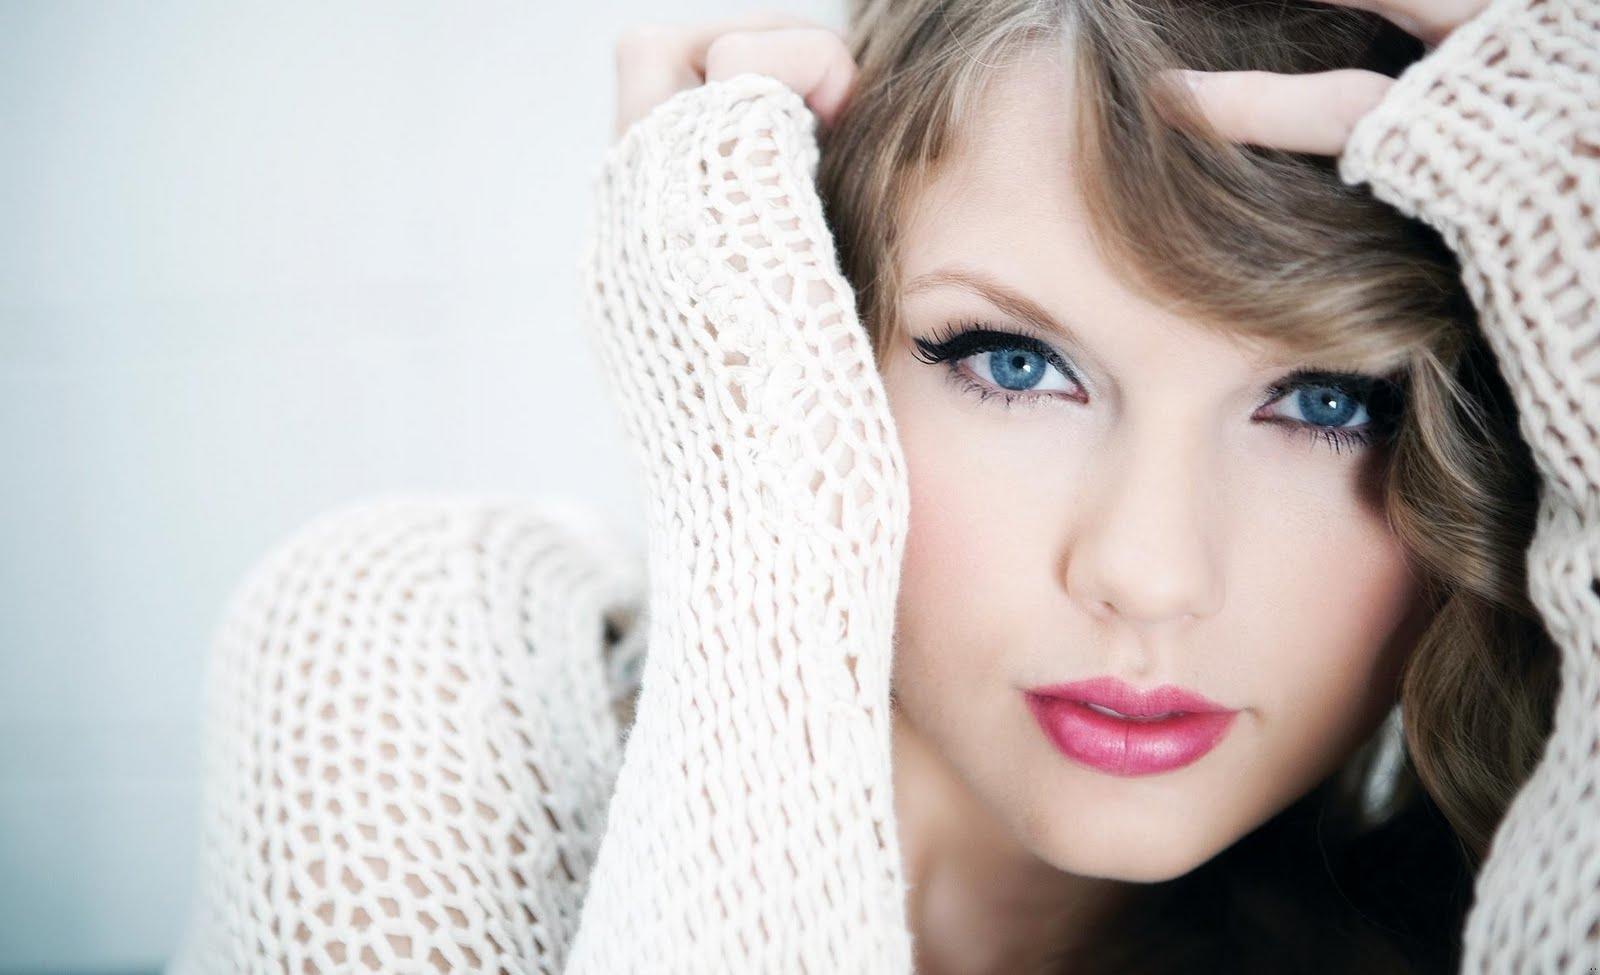 http://1.bp.blogspot.com/-Mwi-kDo-vxQ/TwcuMkKpt_I/AAAAAAAAM8w/icuOPubc9GY/s1600/Taylor_Swift_america_singer_wallpapers.jpg